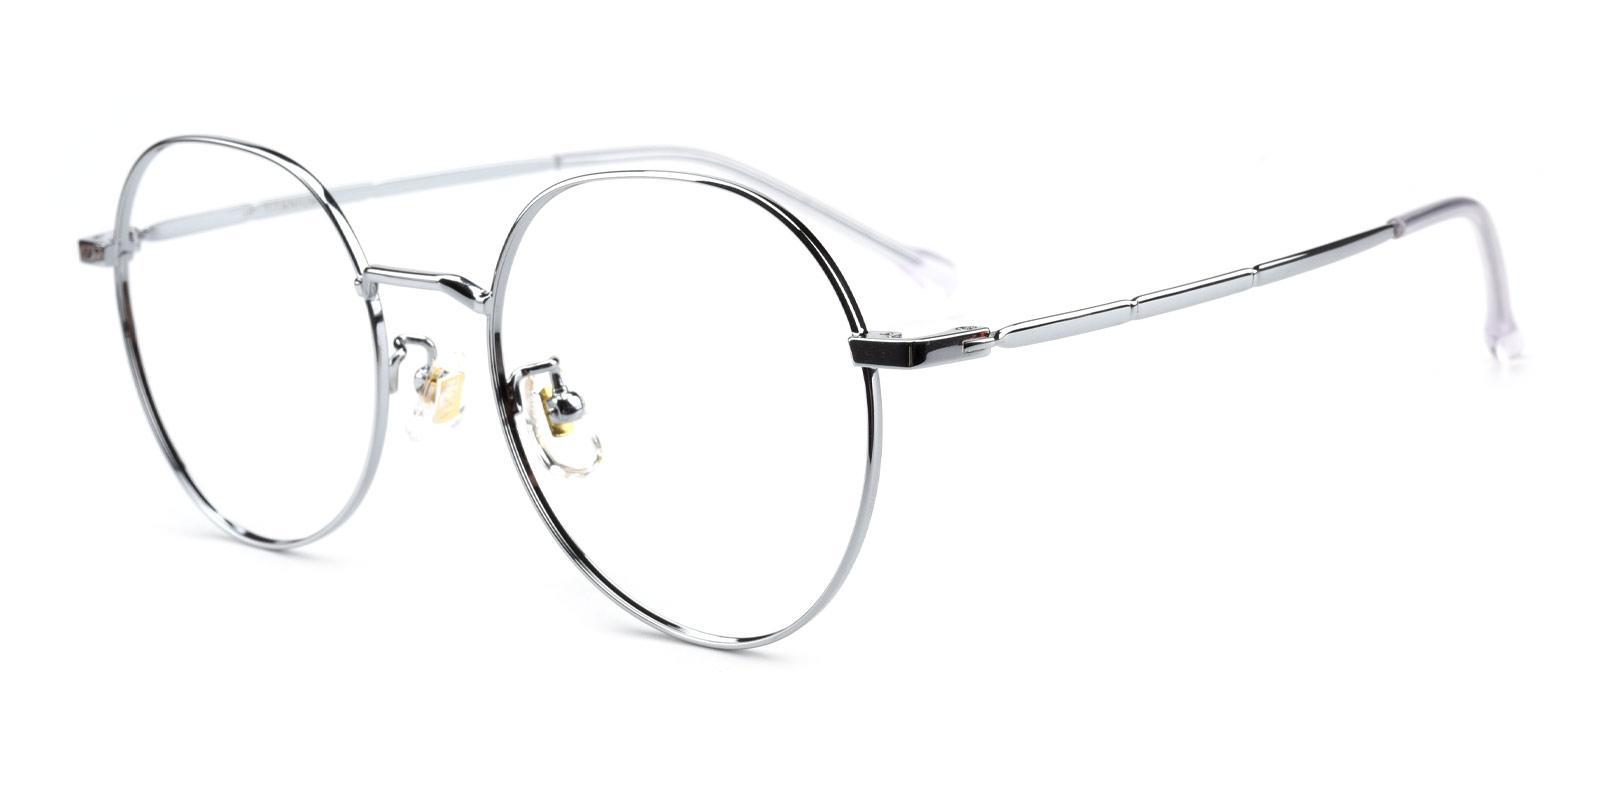 Berkeley-Silver-Round-Titanium-Eyeglasses-additional1